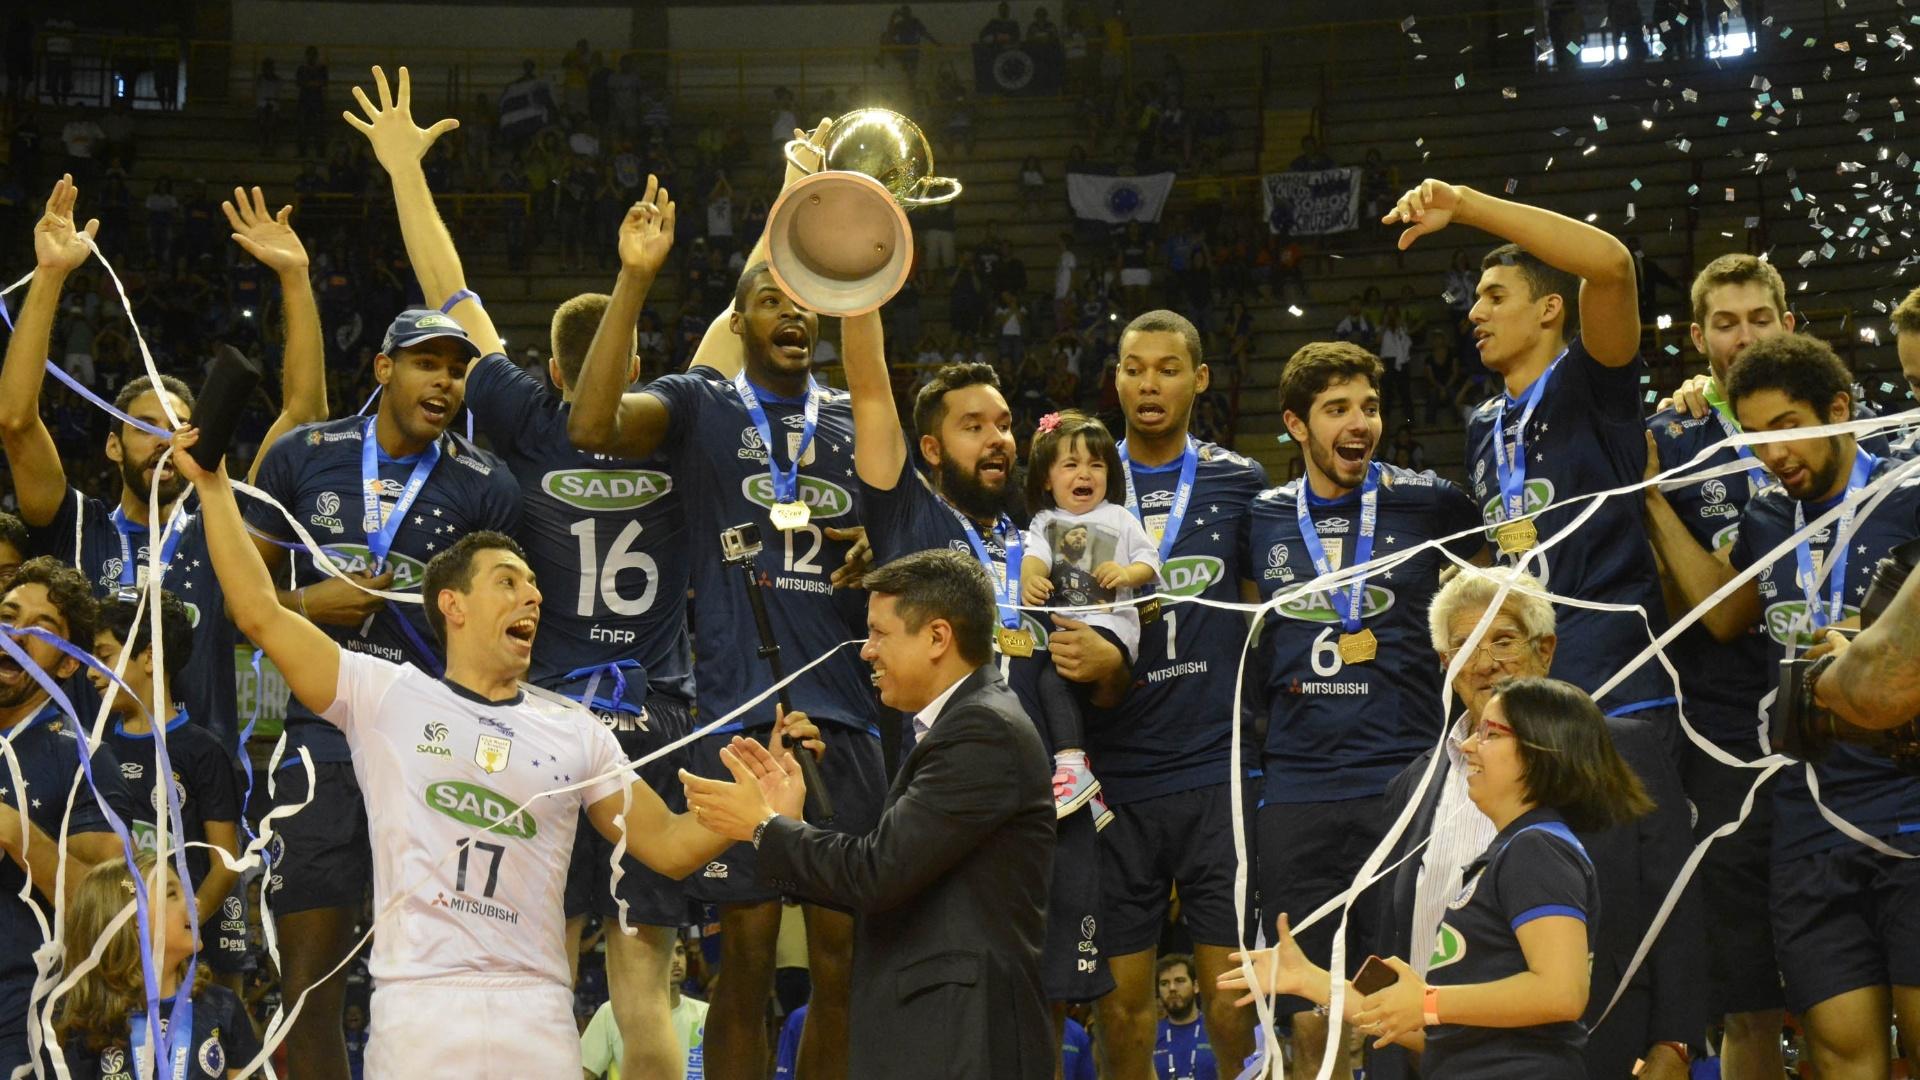 Jogadores do Sada Cruzeiro comemoram título da Superliga sobre o Sesi